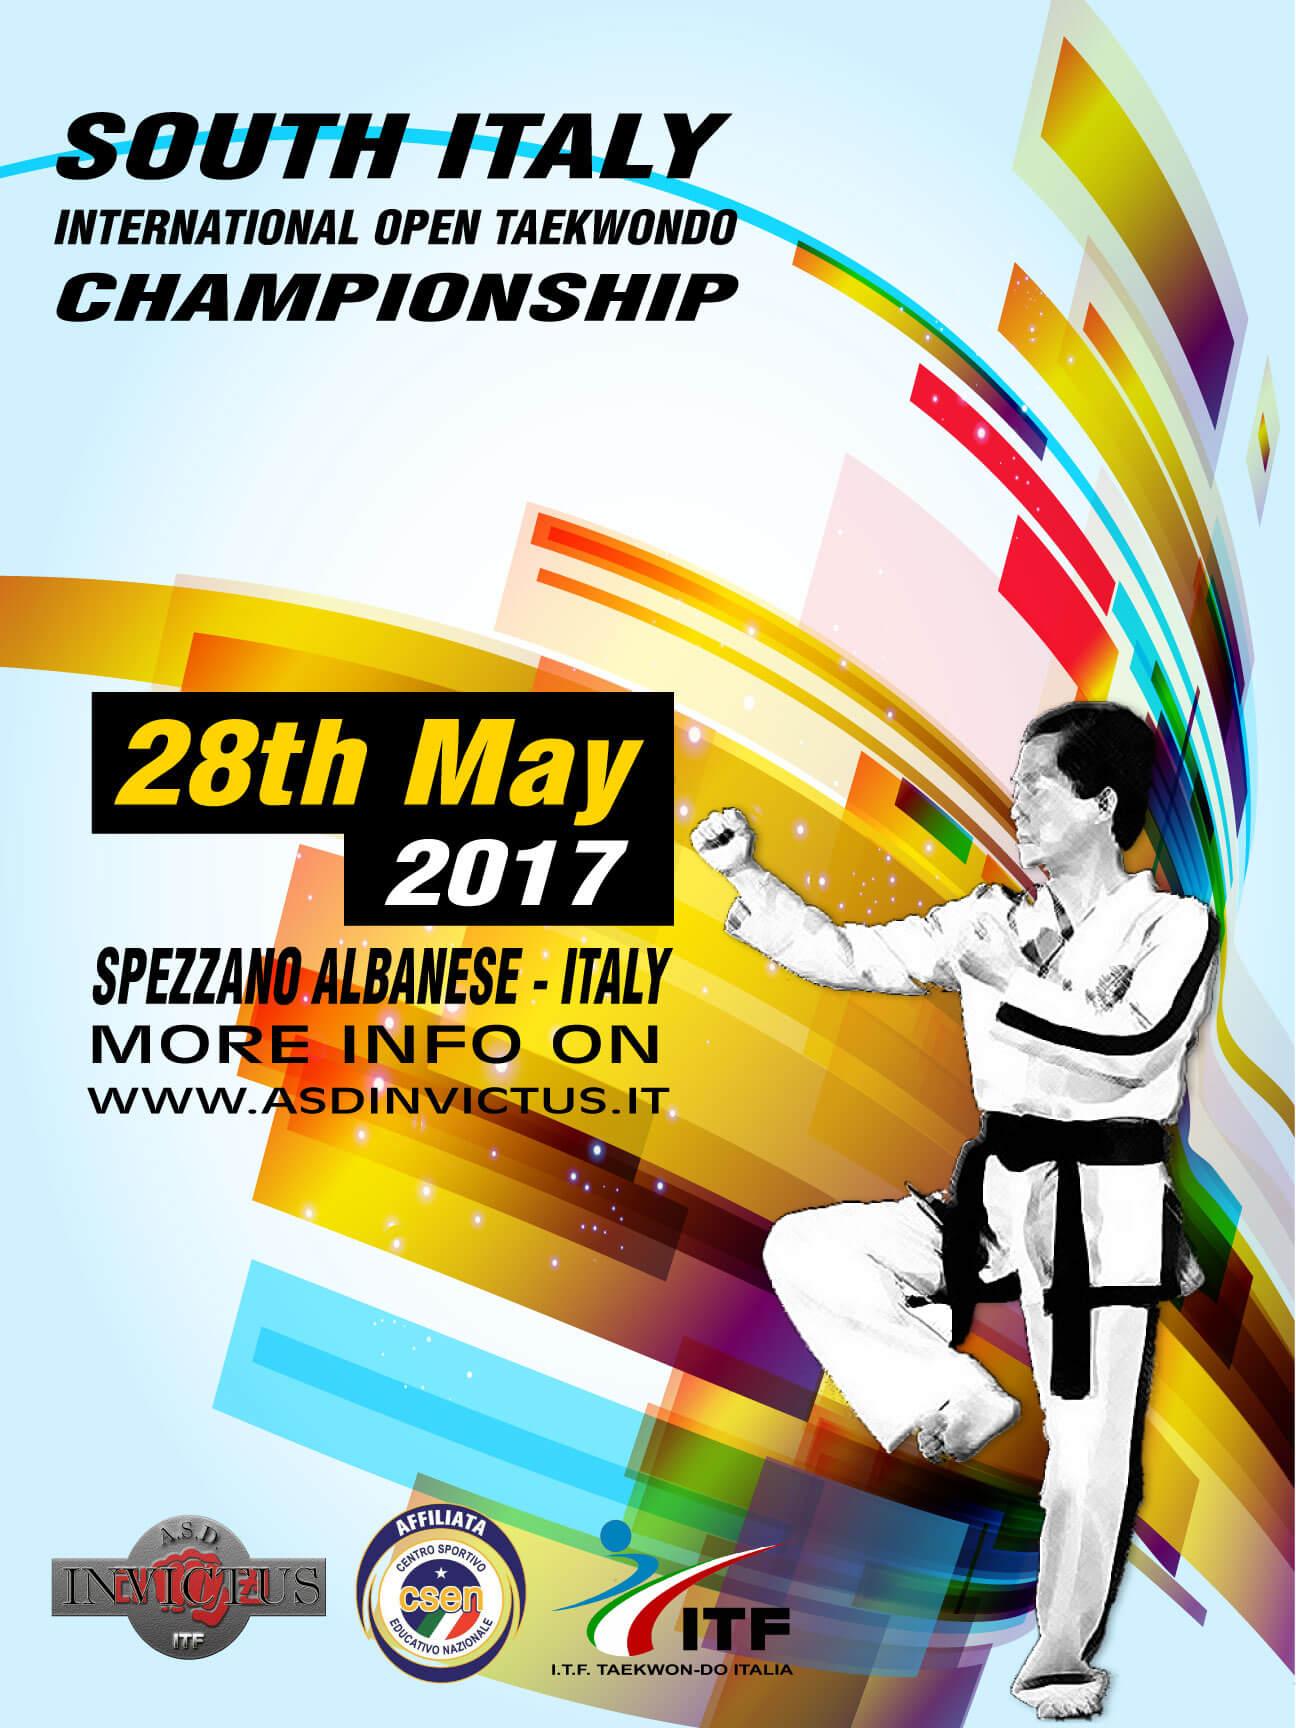 2017 South Italy Open Taekwon-Do Championship